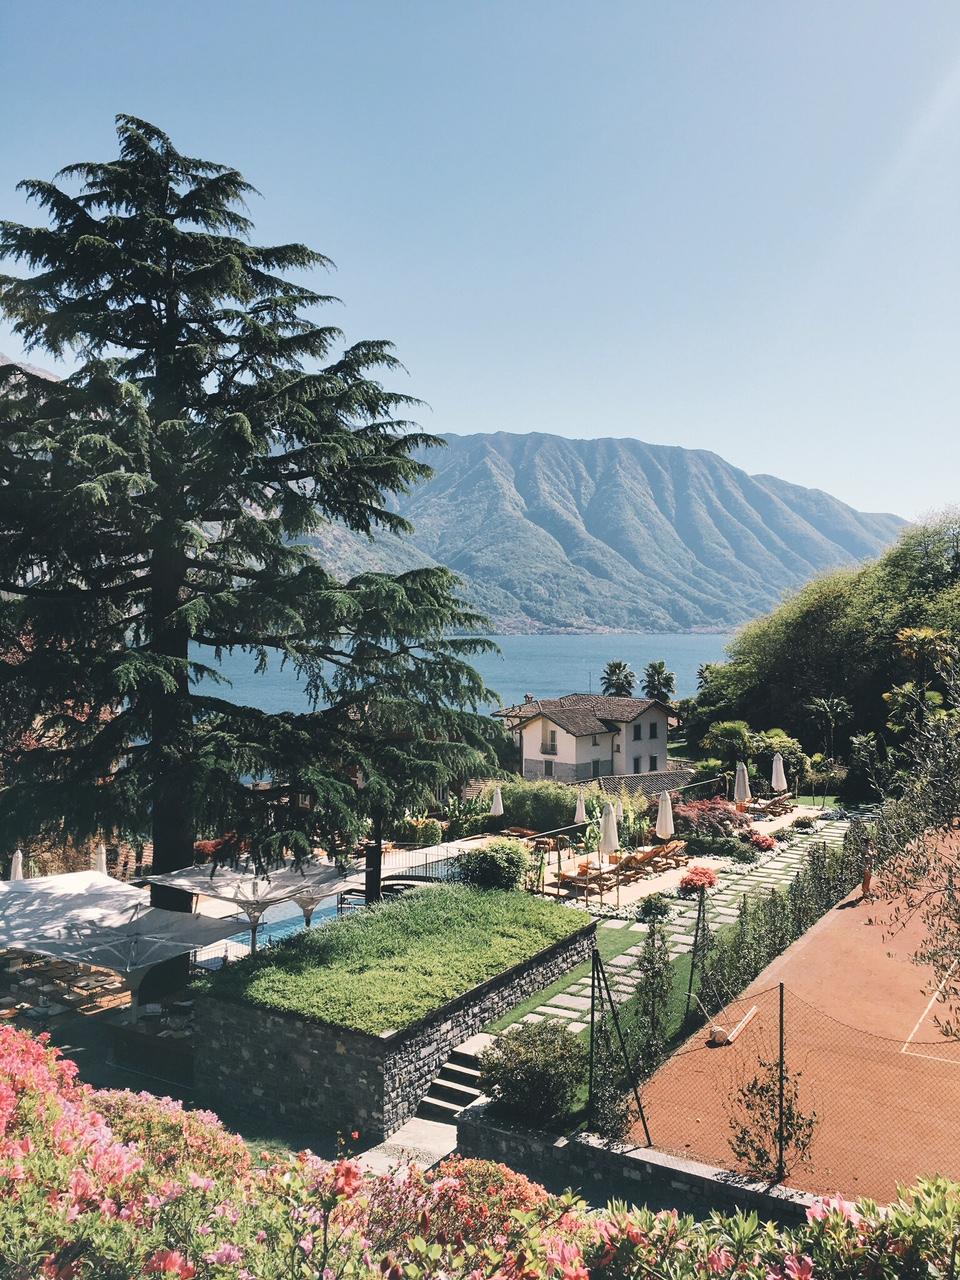 Grand Hotel Tremezzo pool, tennis courts, restaurants